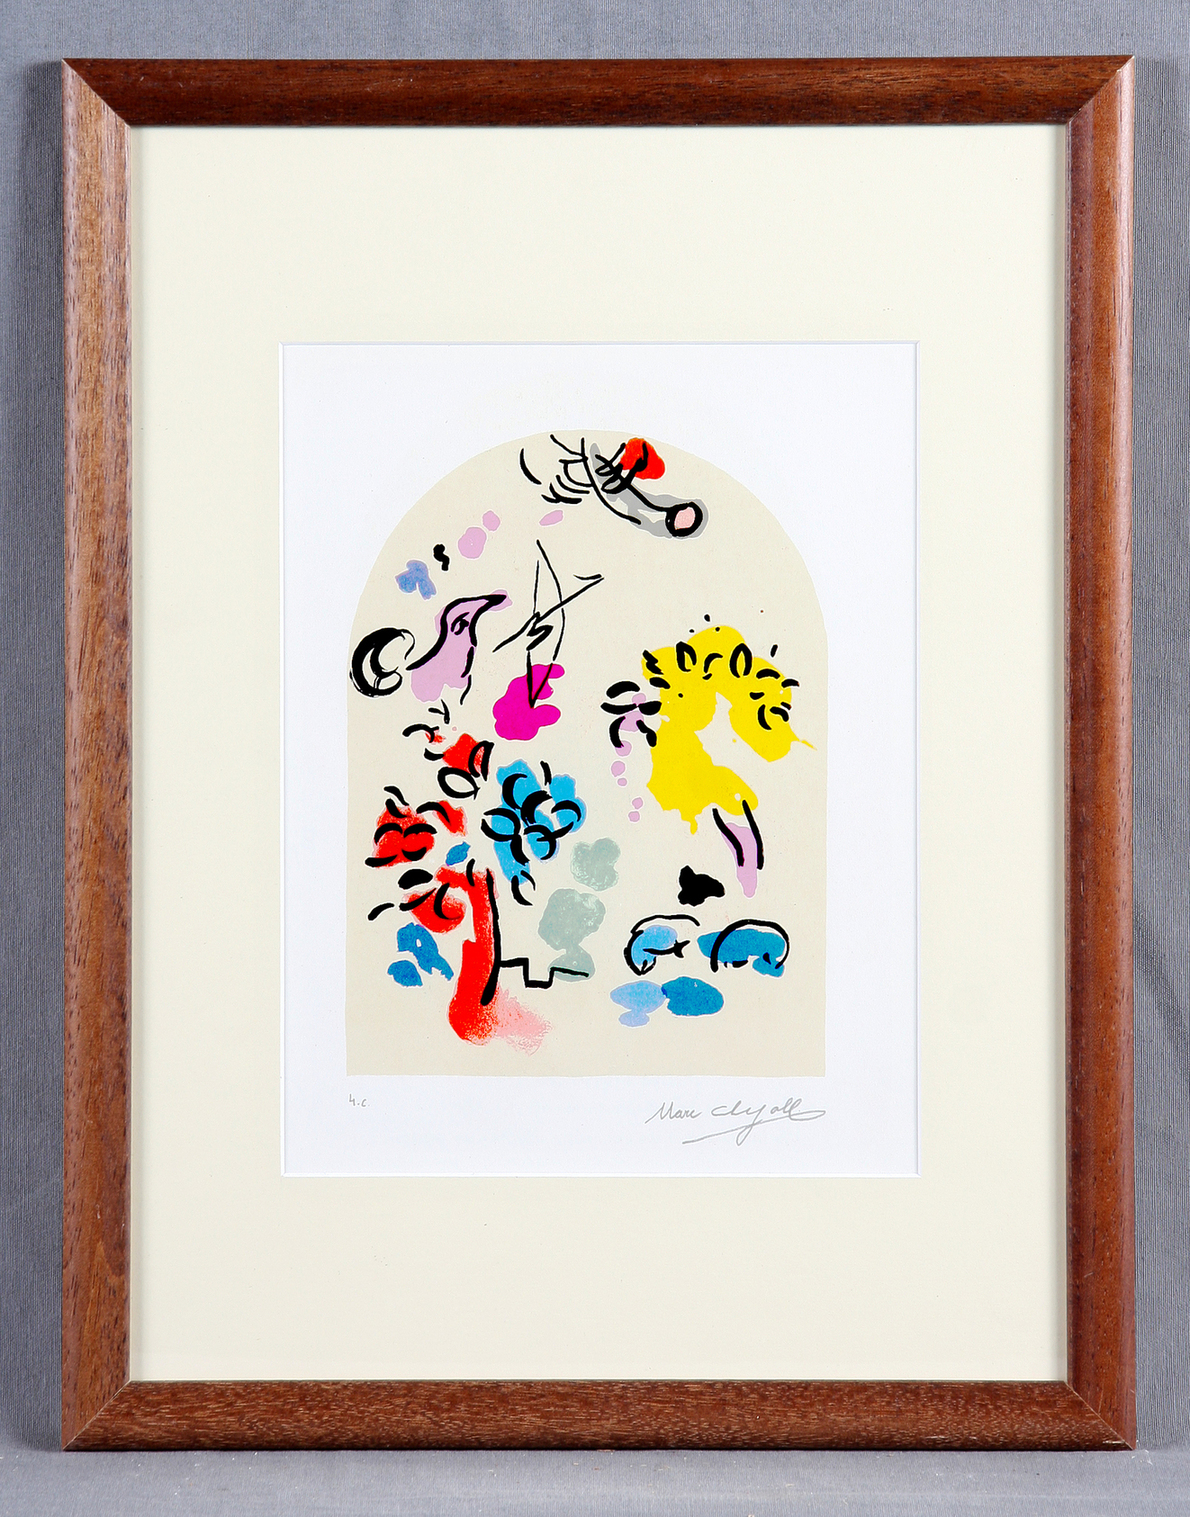 Marc Chagall-Tribe of Joseph, Jerusalem Windows-